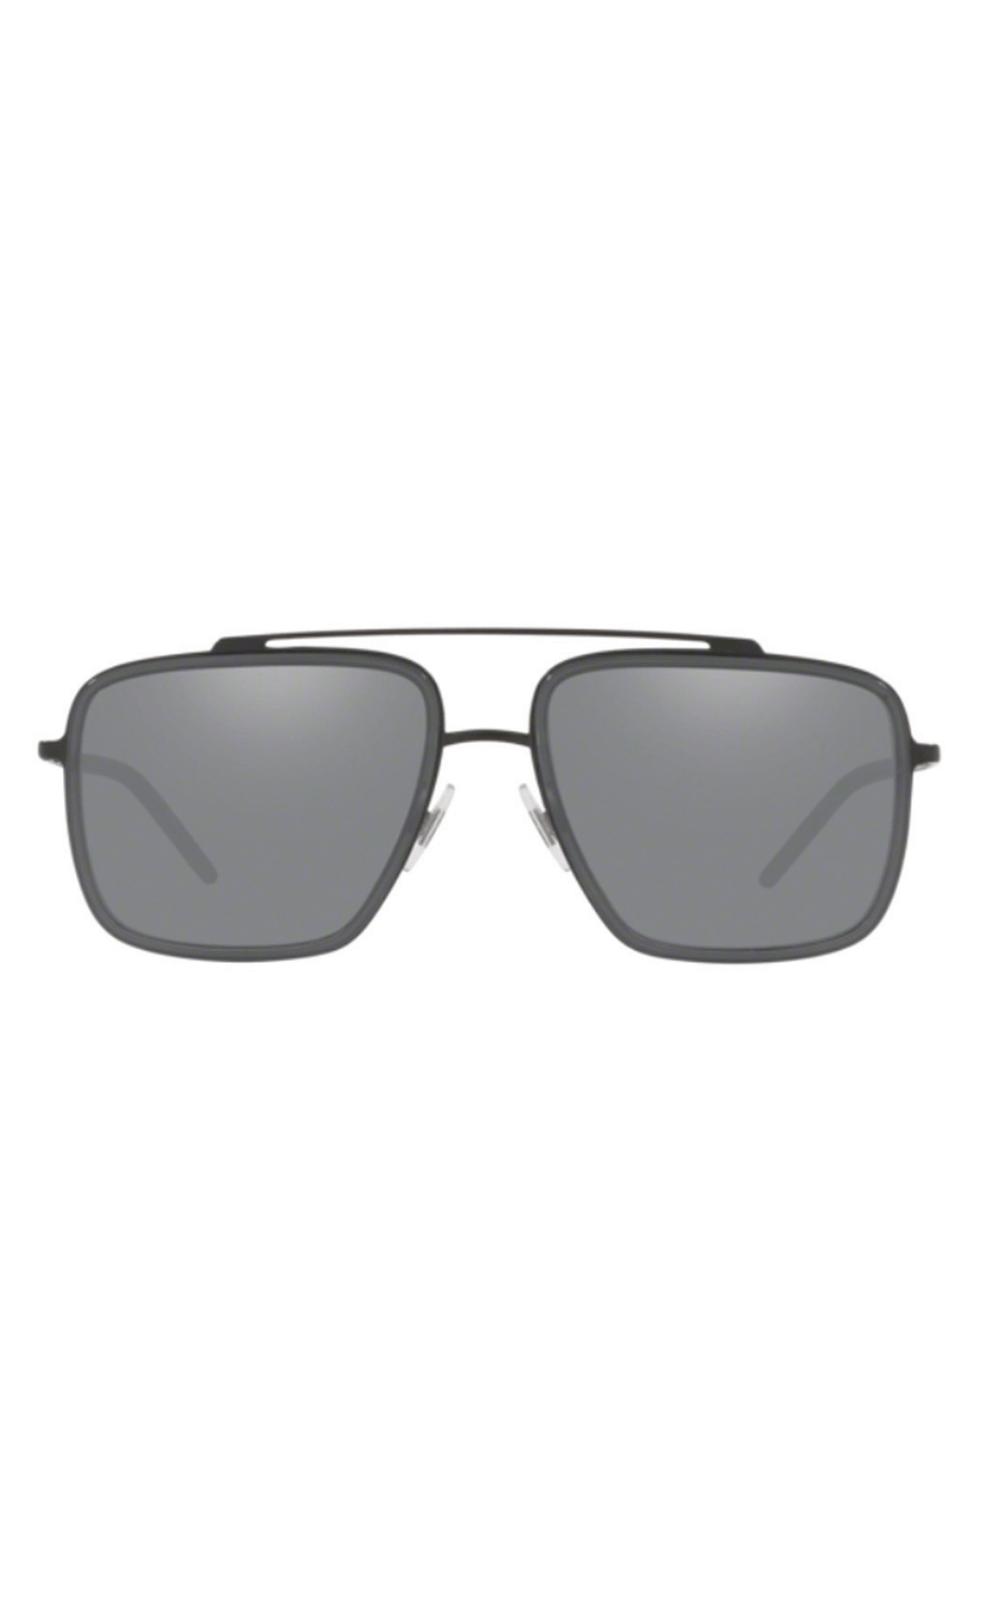 Foto 2 - Óculos de Sol Dolce & Gabbana Madison 22201106/6G